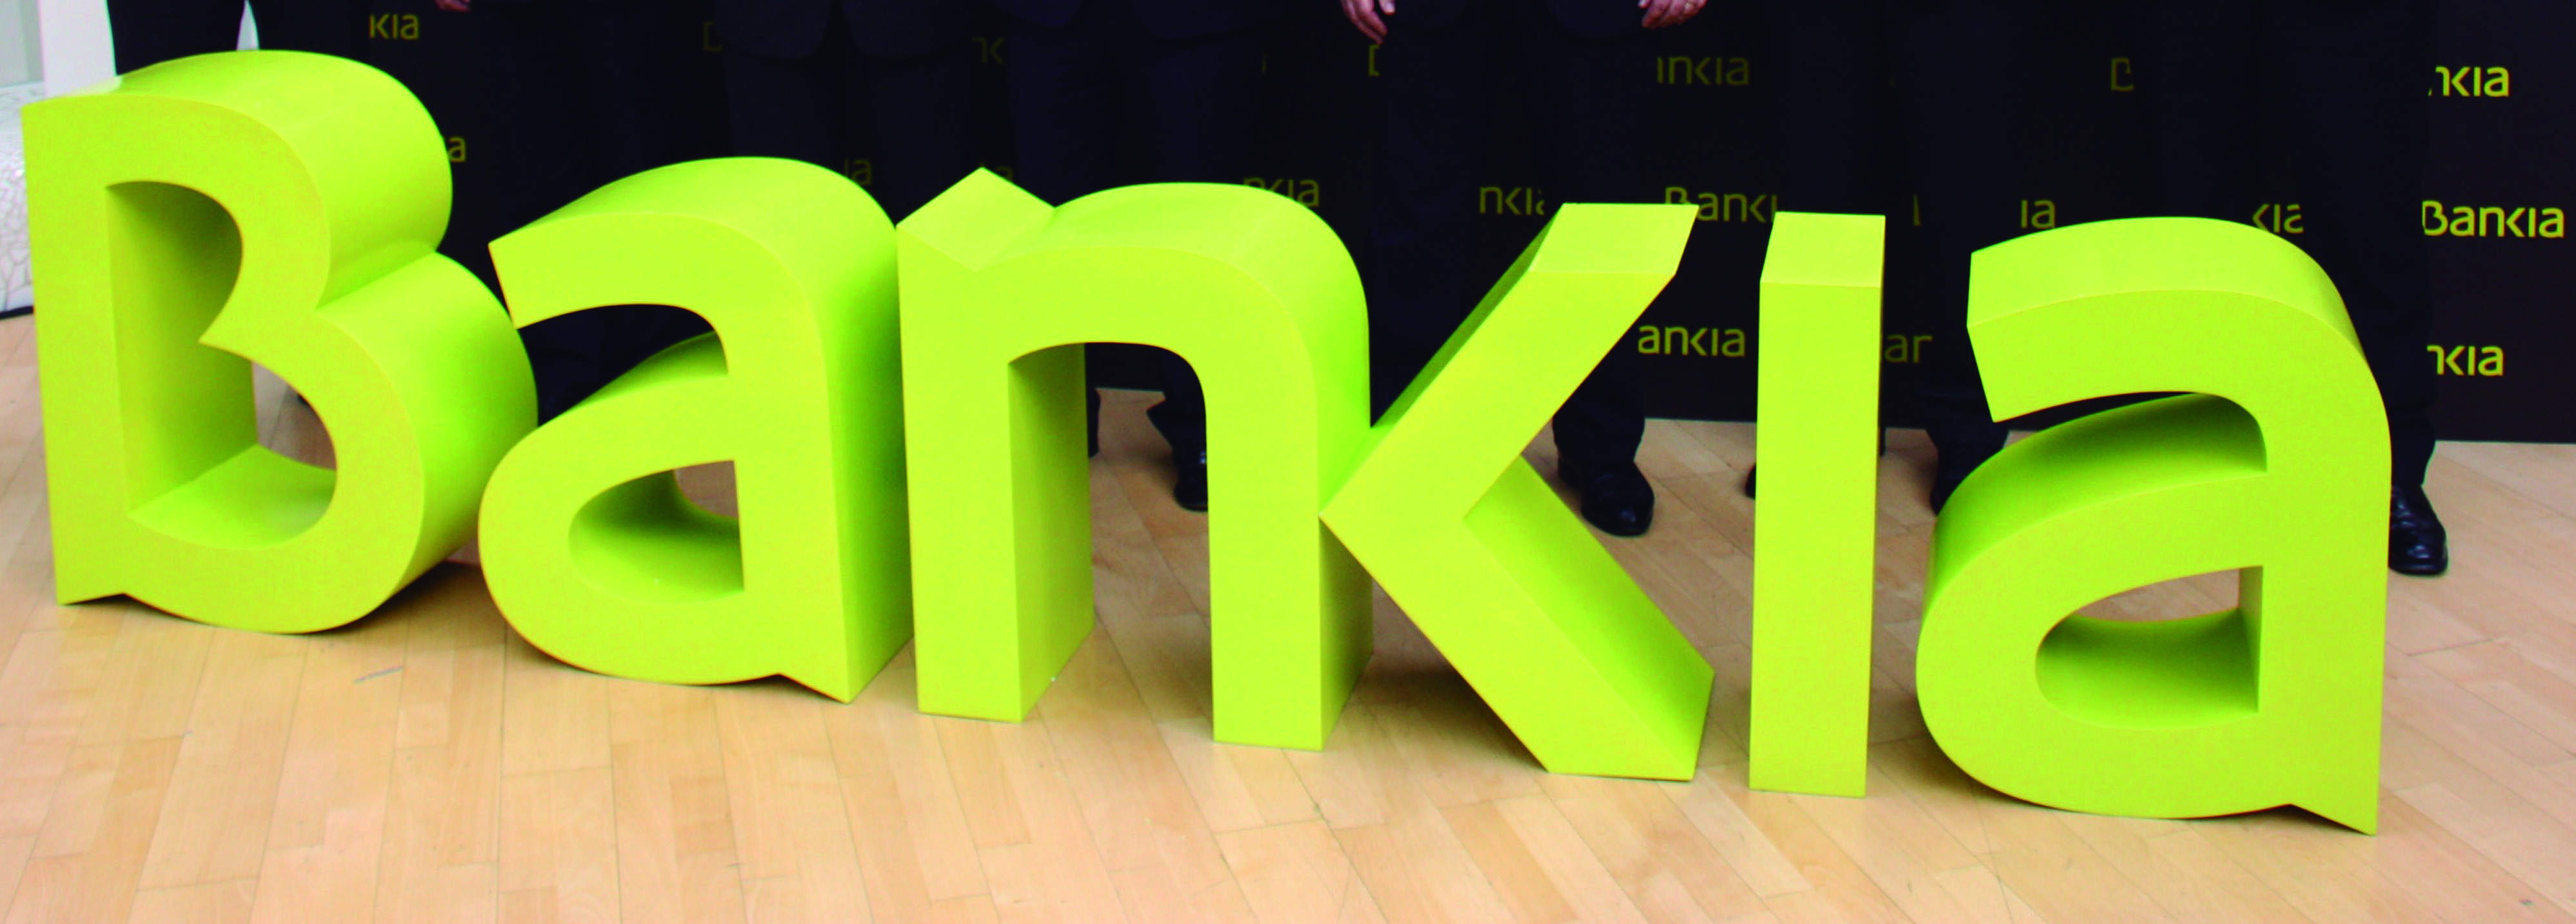 Oficina Telefonica Bankia Blog De Opcionis